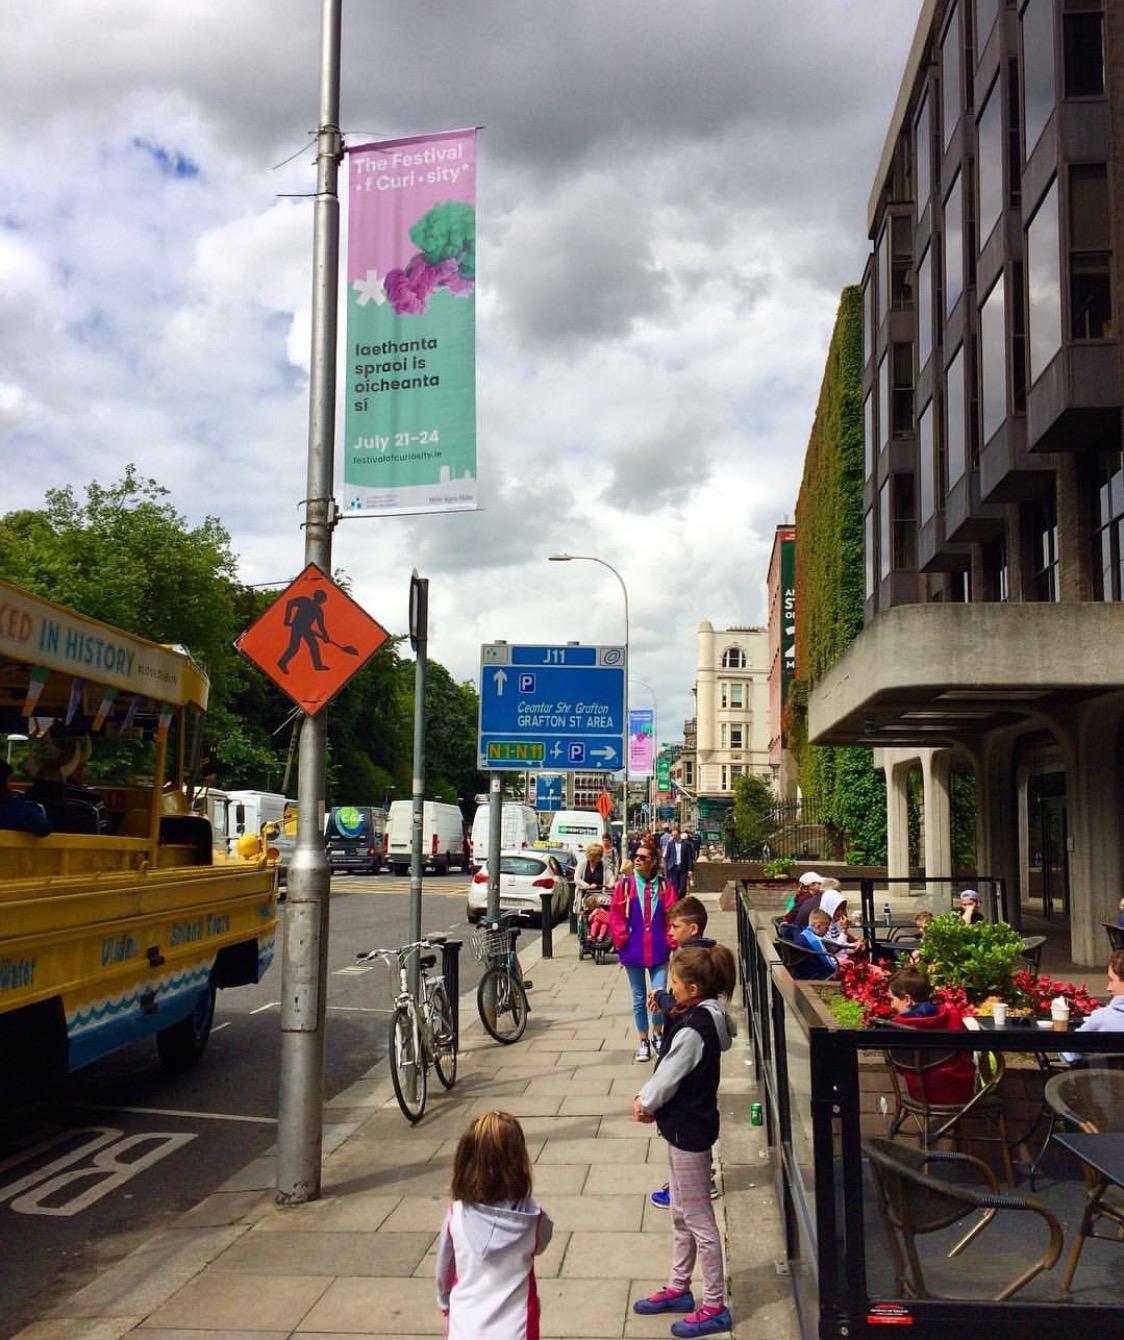 Curious Dublin Banners